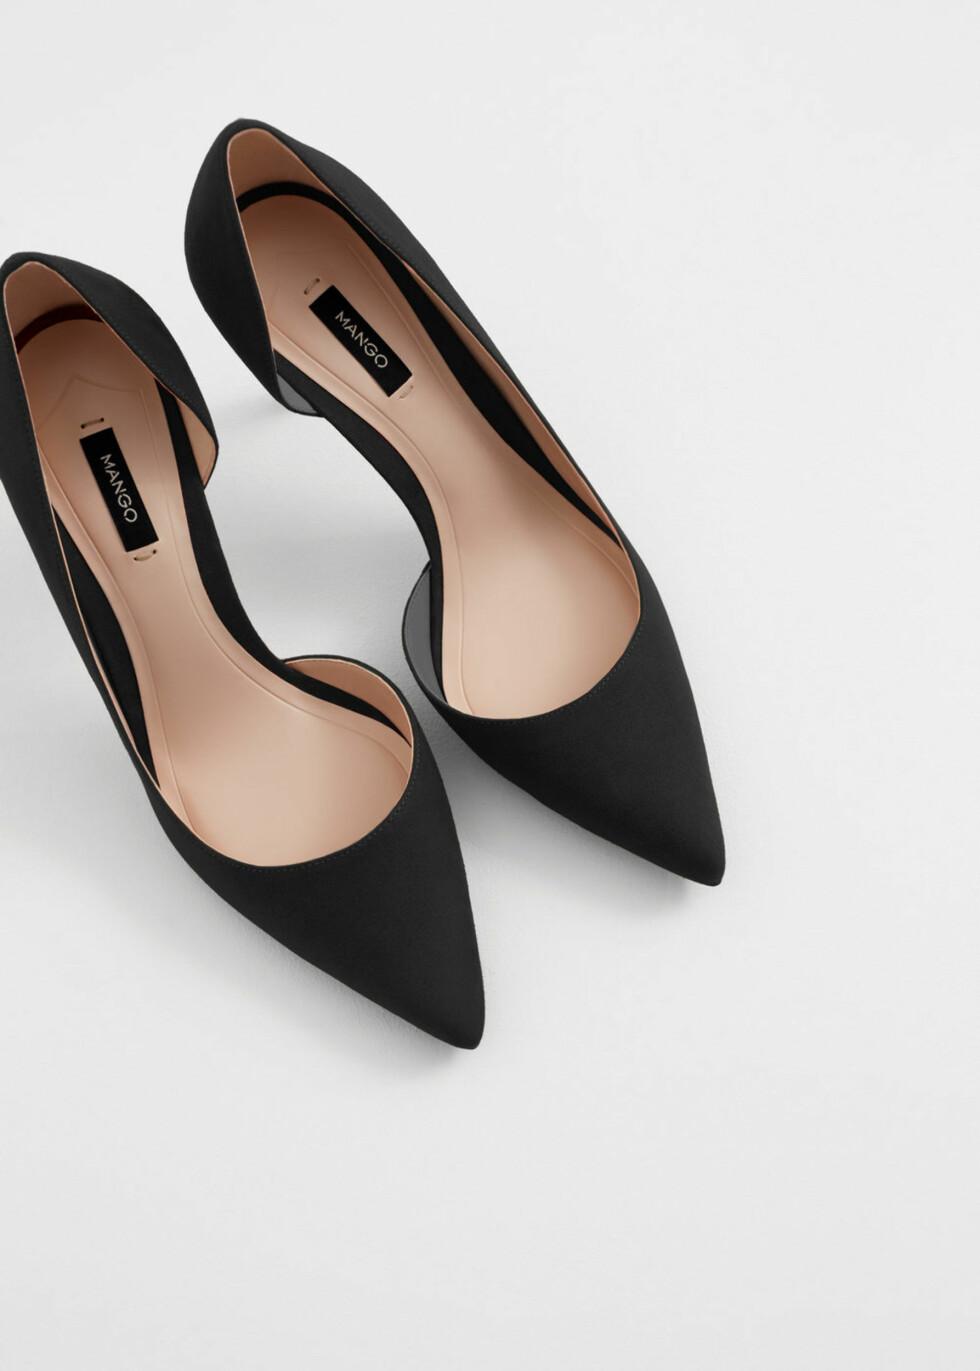 Hæler fra Mango | kr 349 | http://shop.mango.com/NO/p1/damer/tilbeh%C3%B8r/sko/h%C3%B8yh%C3%A6lte-sko/pensko?id=73040296_99&n=1&s=accesorios&ts=1480675576670